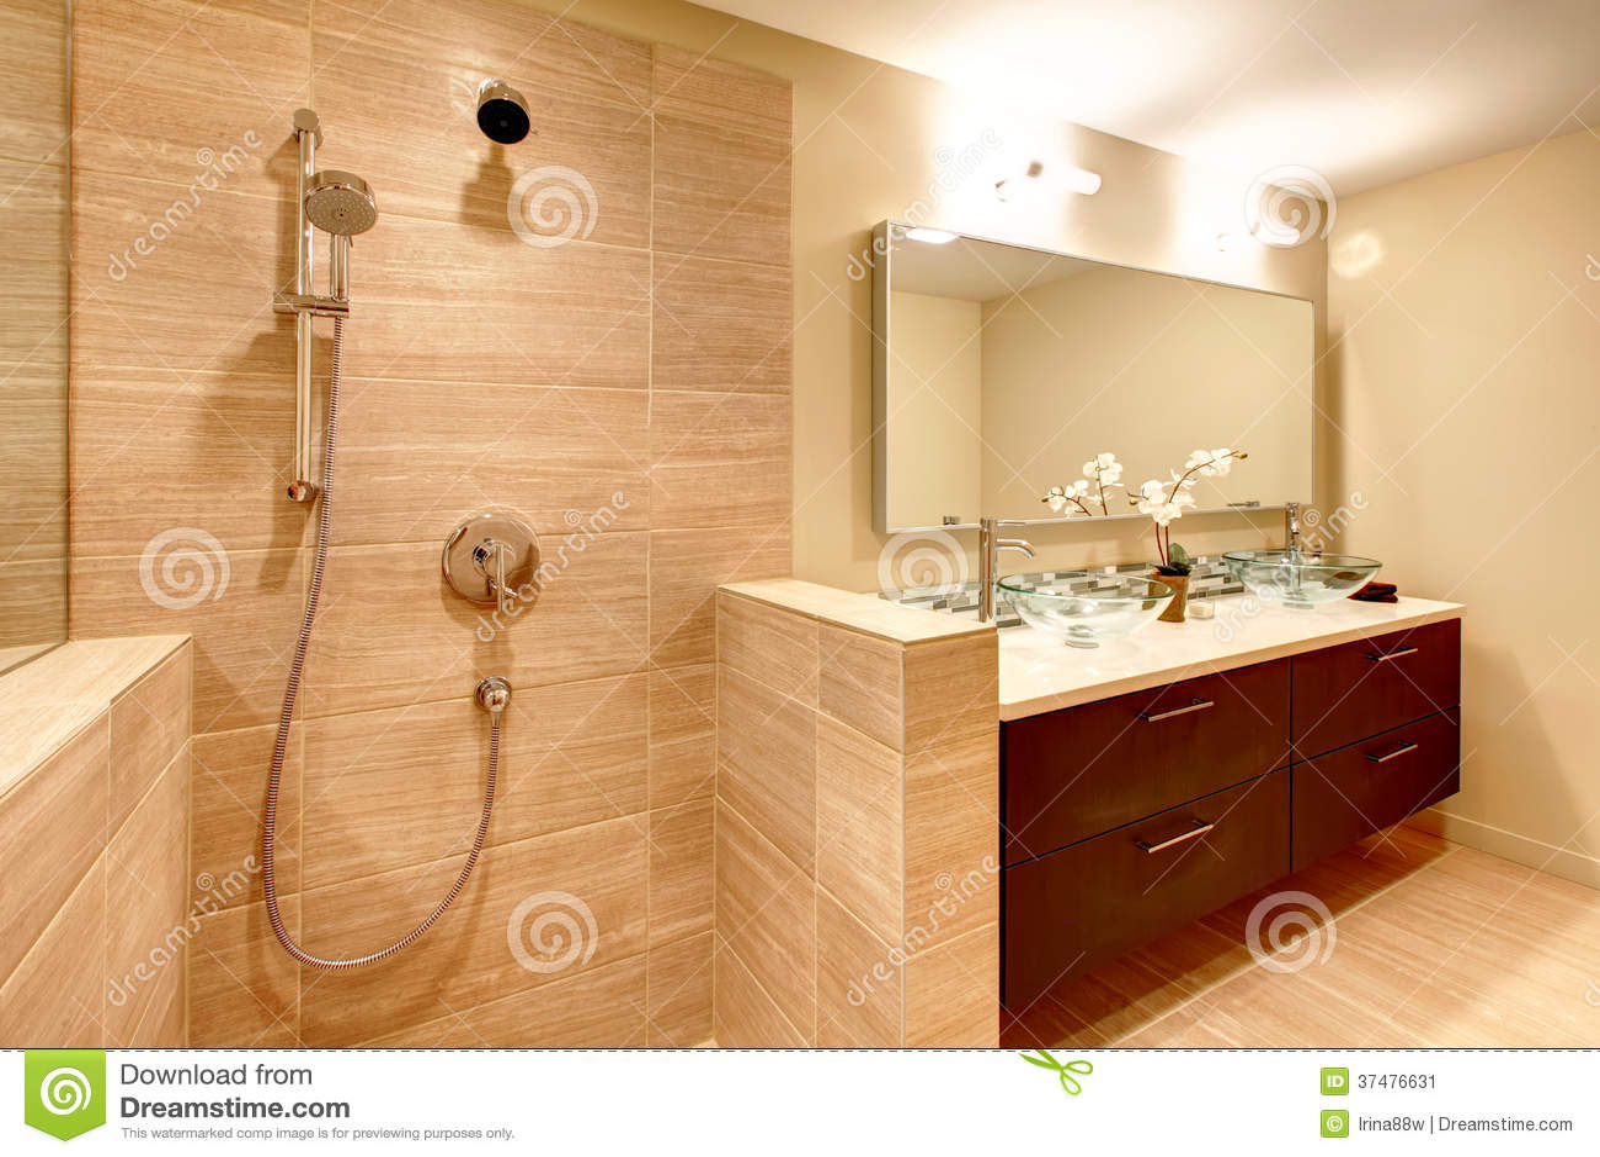 Elegant warm tones bathroom stock image image 37476631 - Image of bath room ...